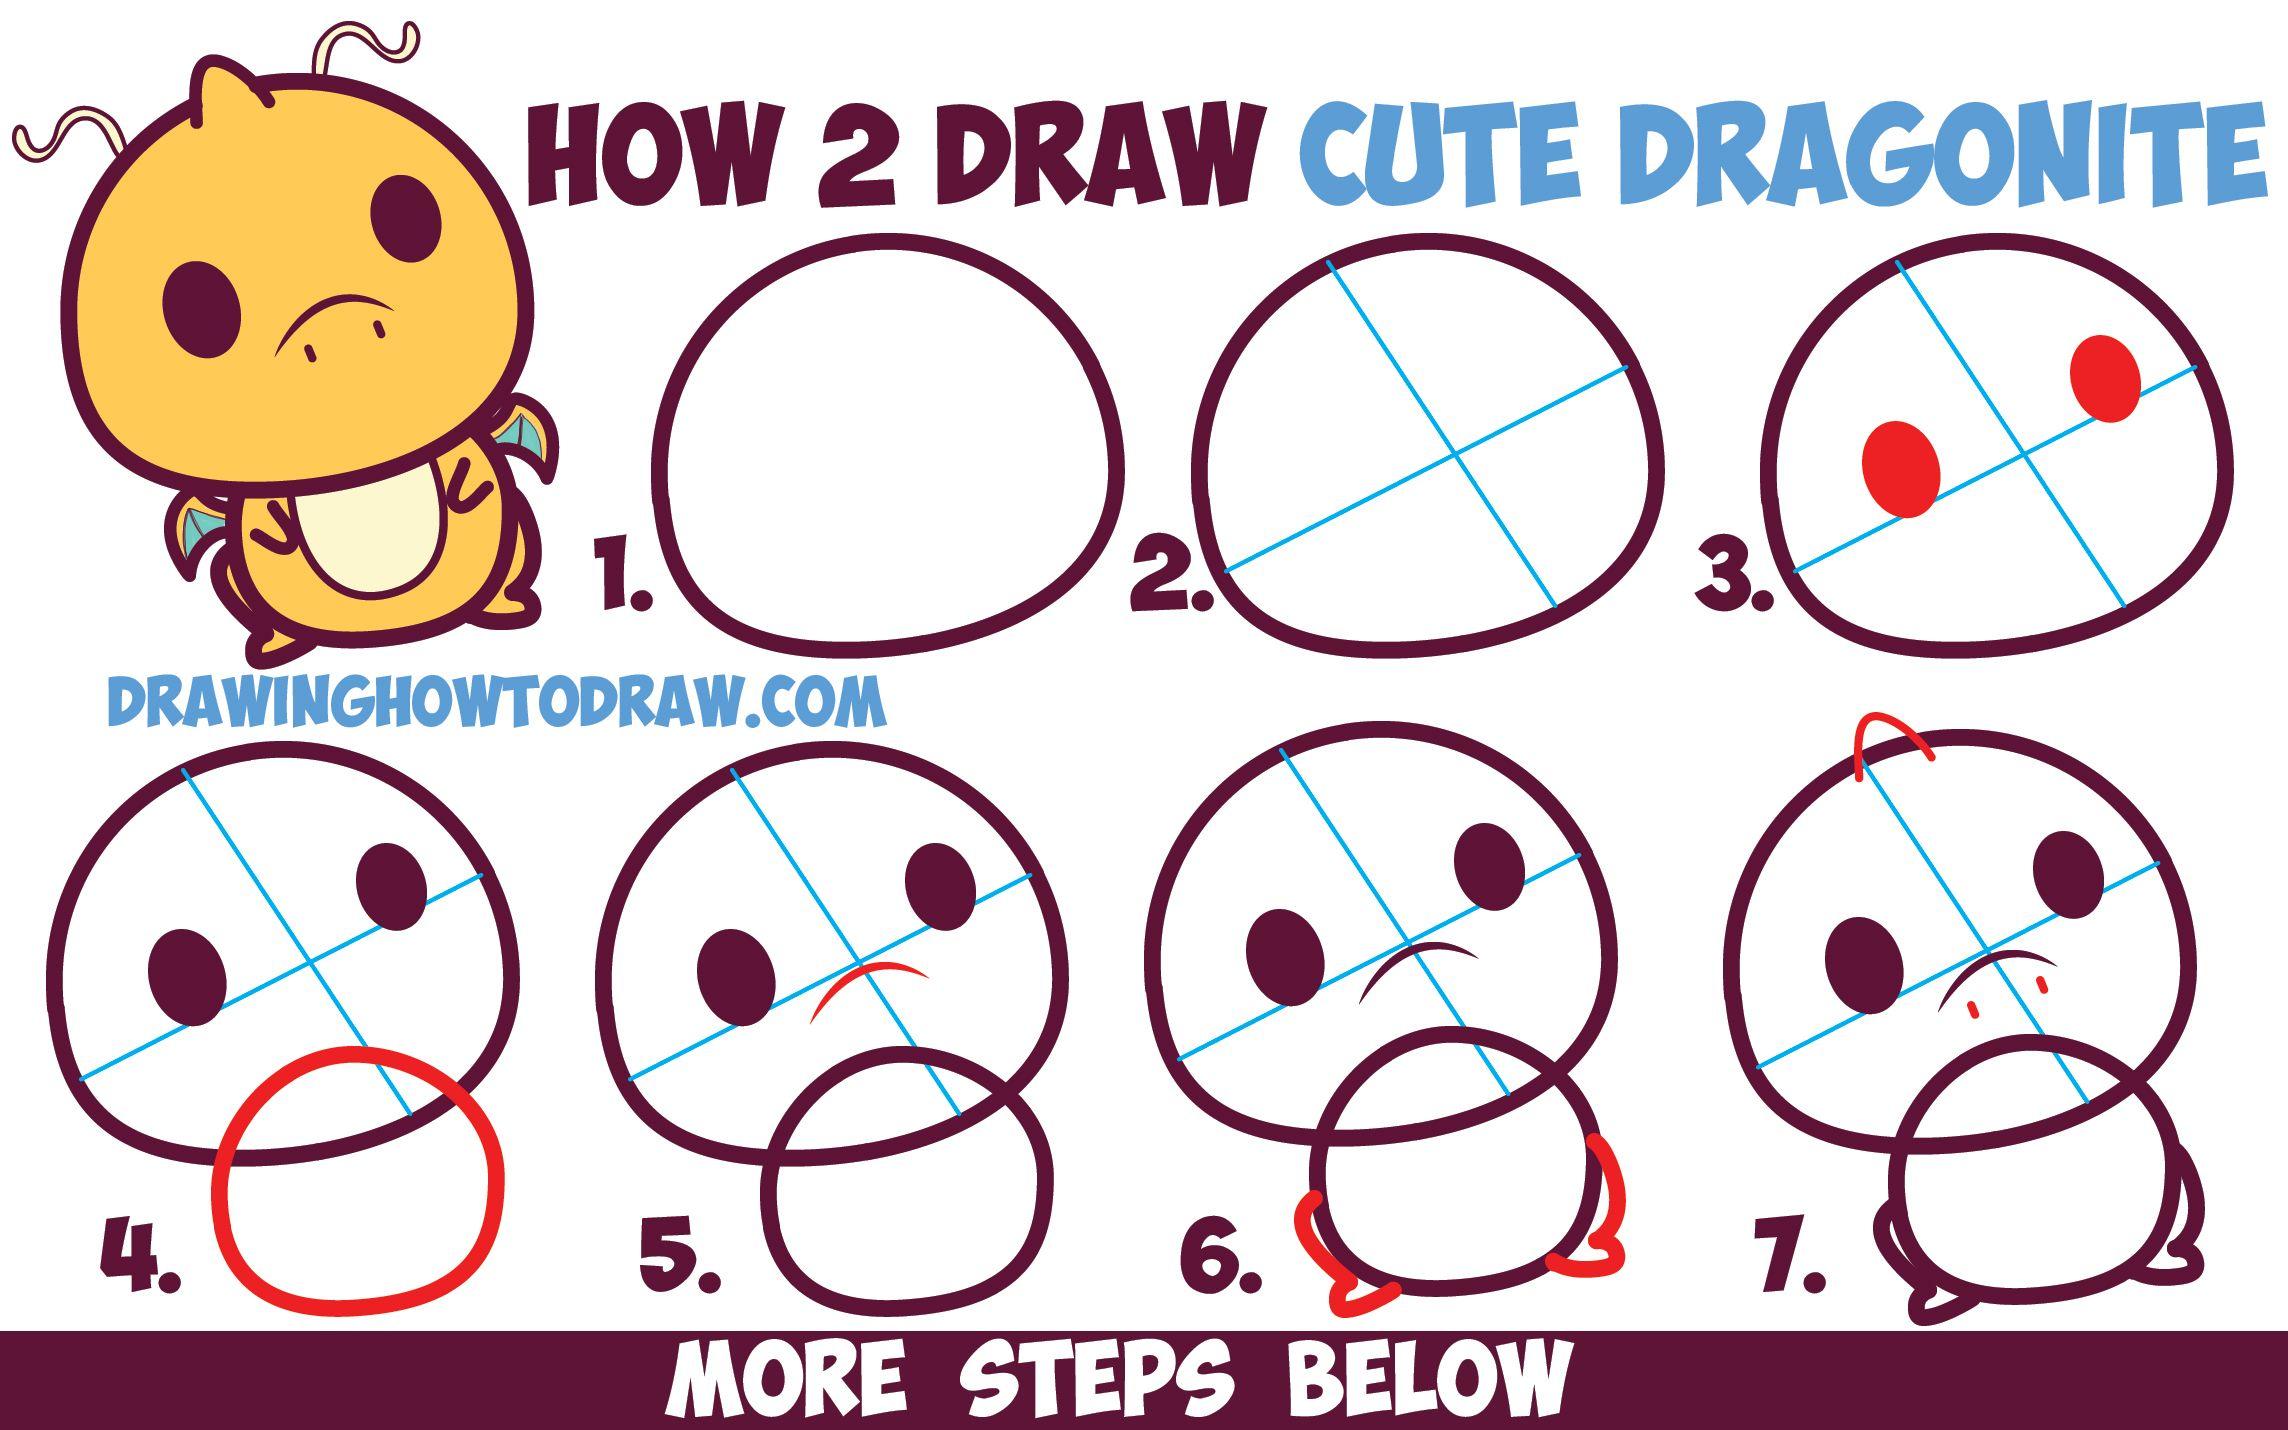 How To Draw Cute Dragonite Chibi Kawaii From Pokemon